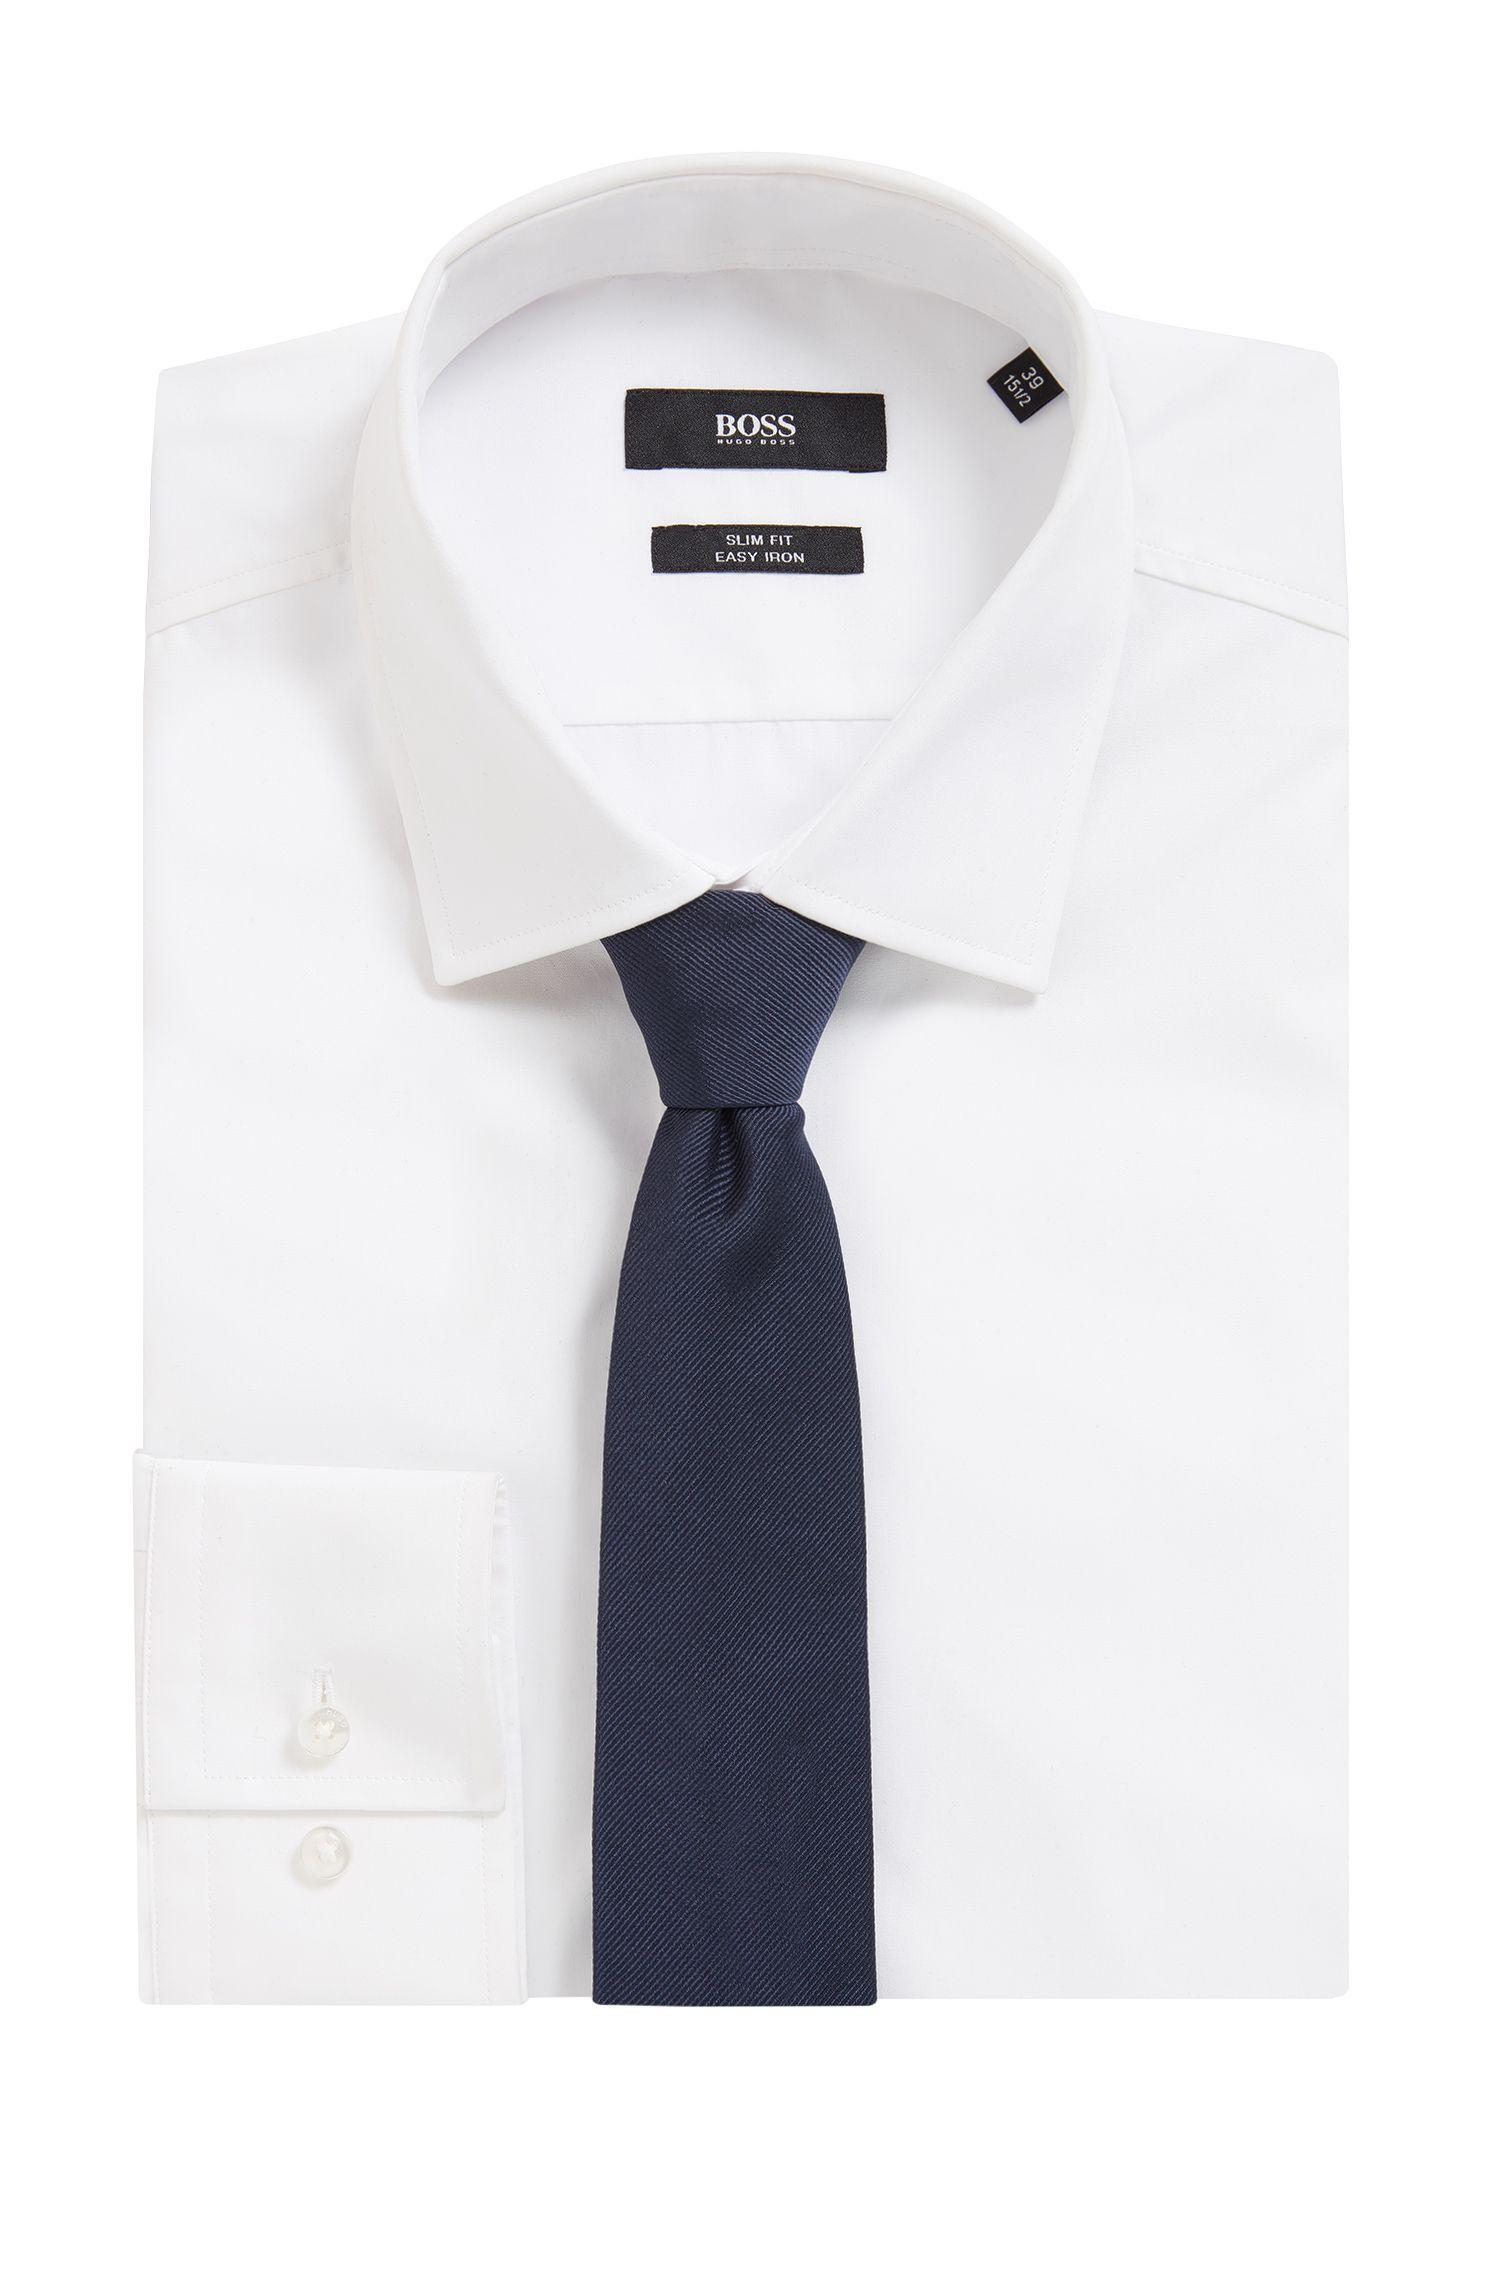 BOSS Tailored Italian Silk Twill Slim Tie, Dark Blue